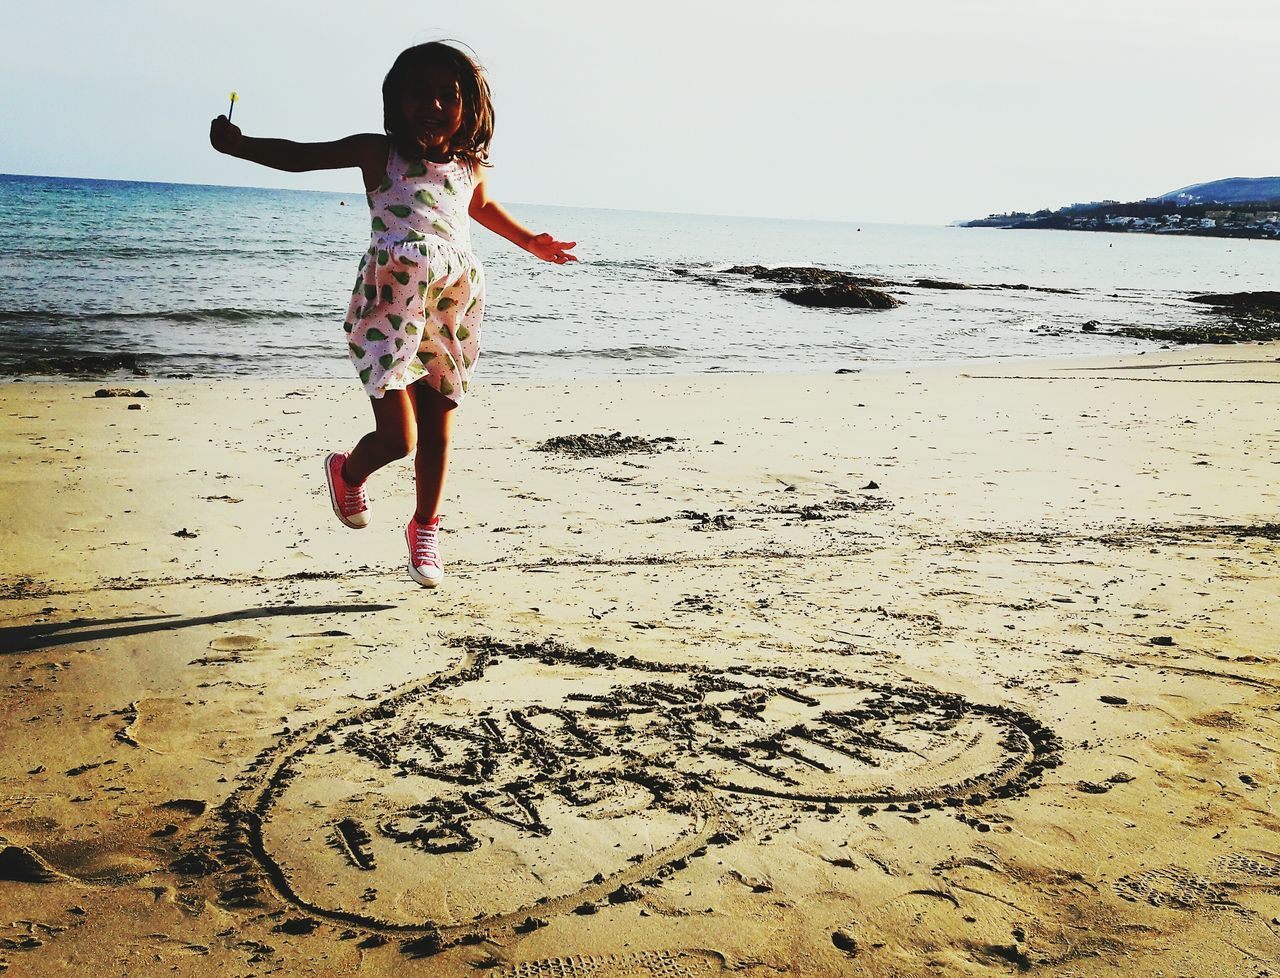 Beach Sand Child Sea Joy Outdoors Horizon Over Water Vacations Fuerteventura Beach Girl Lollipop First Eyeem Photo